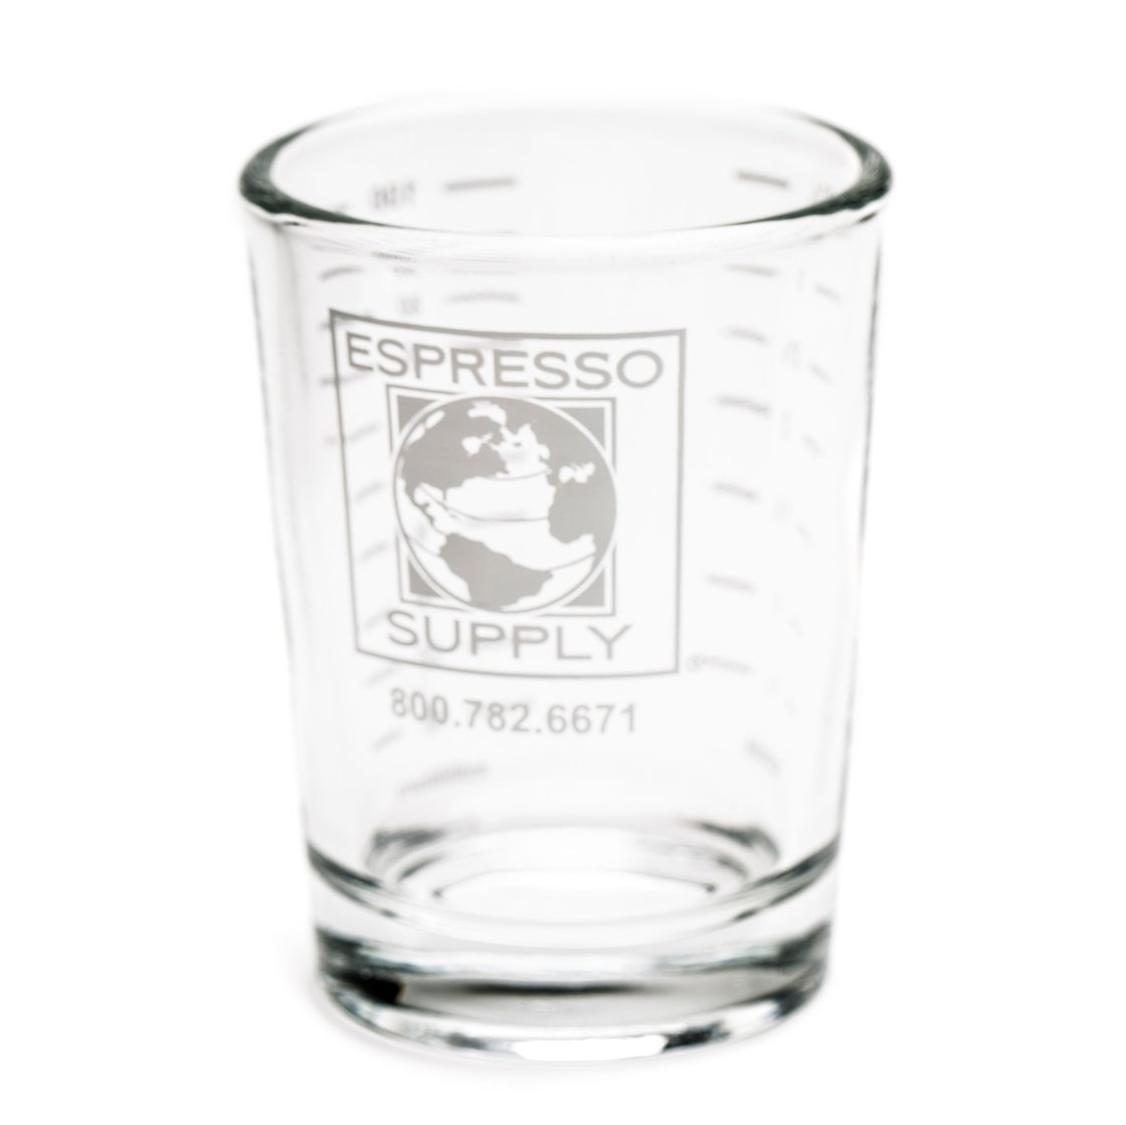 Espresso Supply / Rattleware 4oz Logo Shot Glass